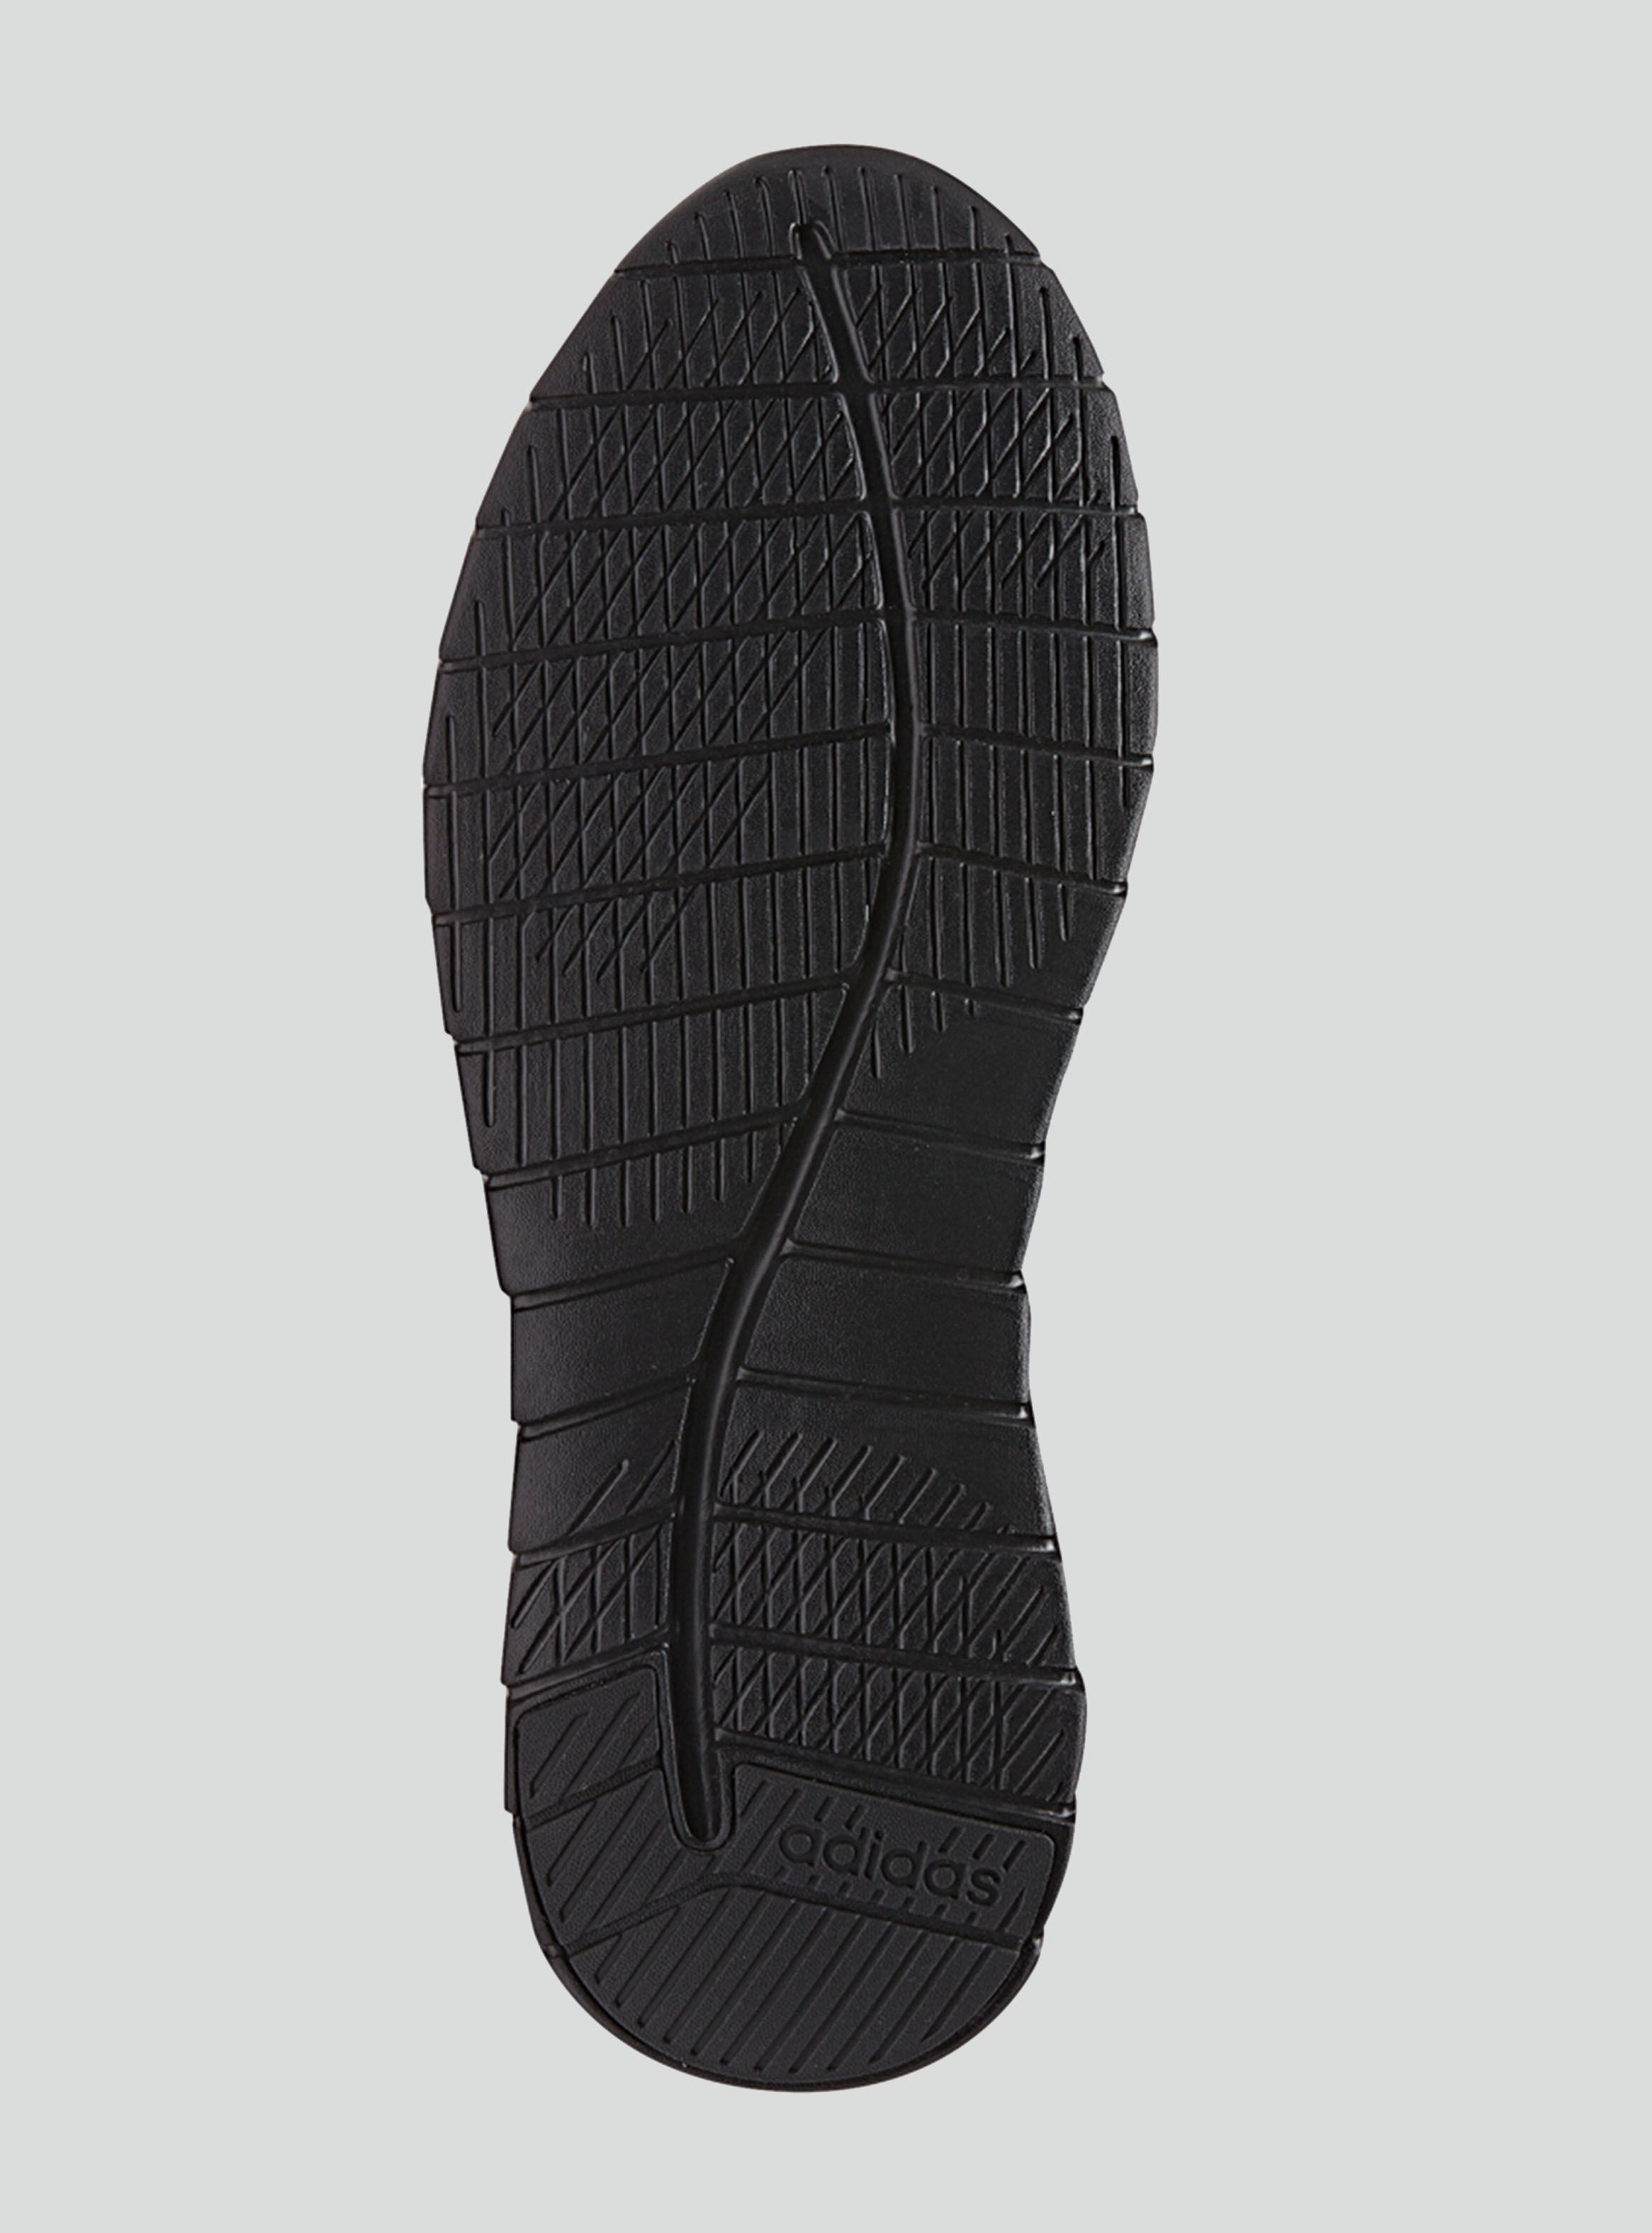 Adidas Hombre Running Zapatilla ZapatillasParis En Asweerun c3RjAL5qS4